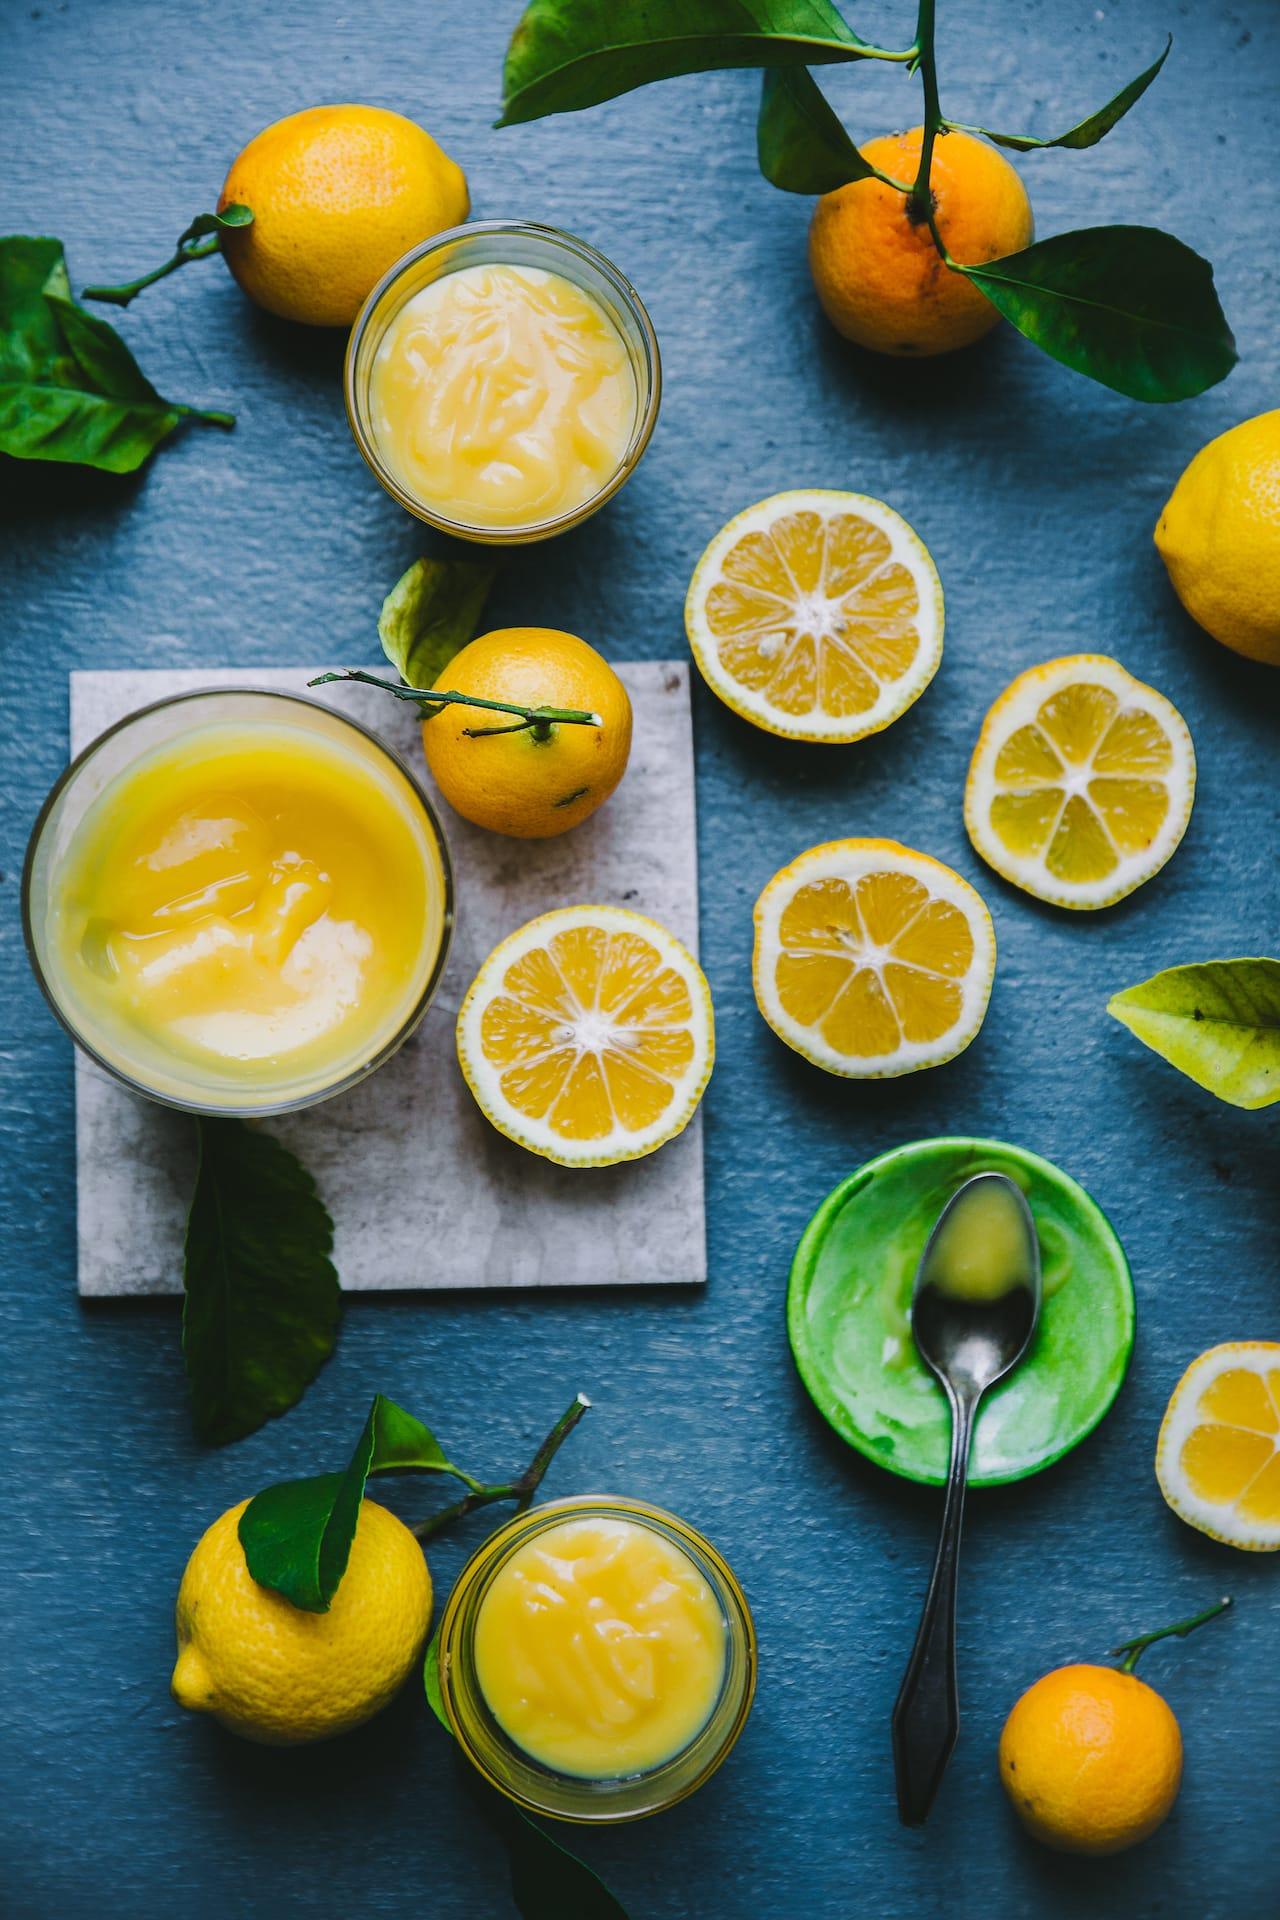 Easy Lemon Curd | Playful Cooking #lemon #curd #foodphotography